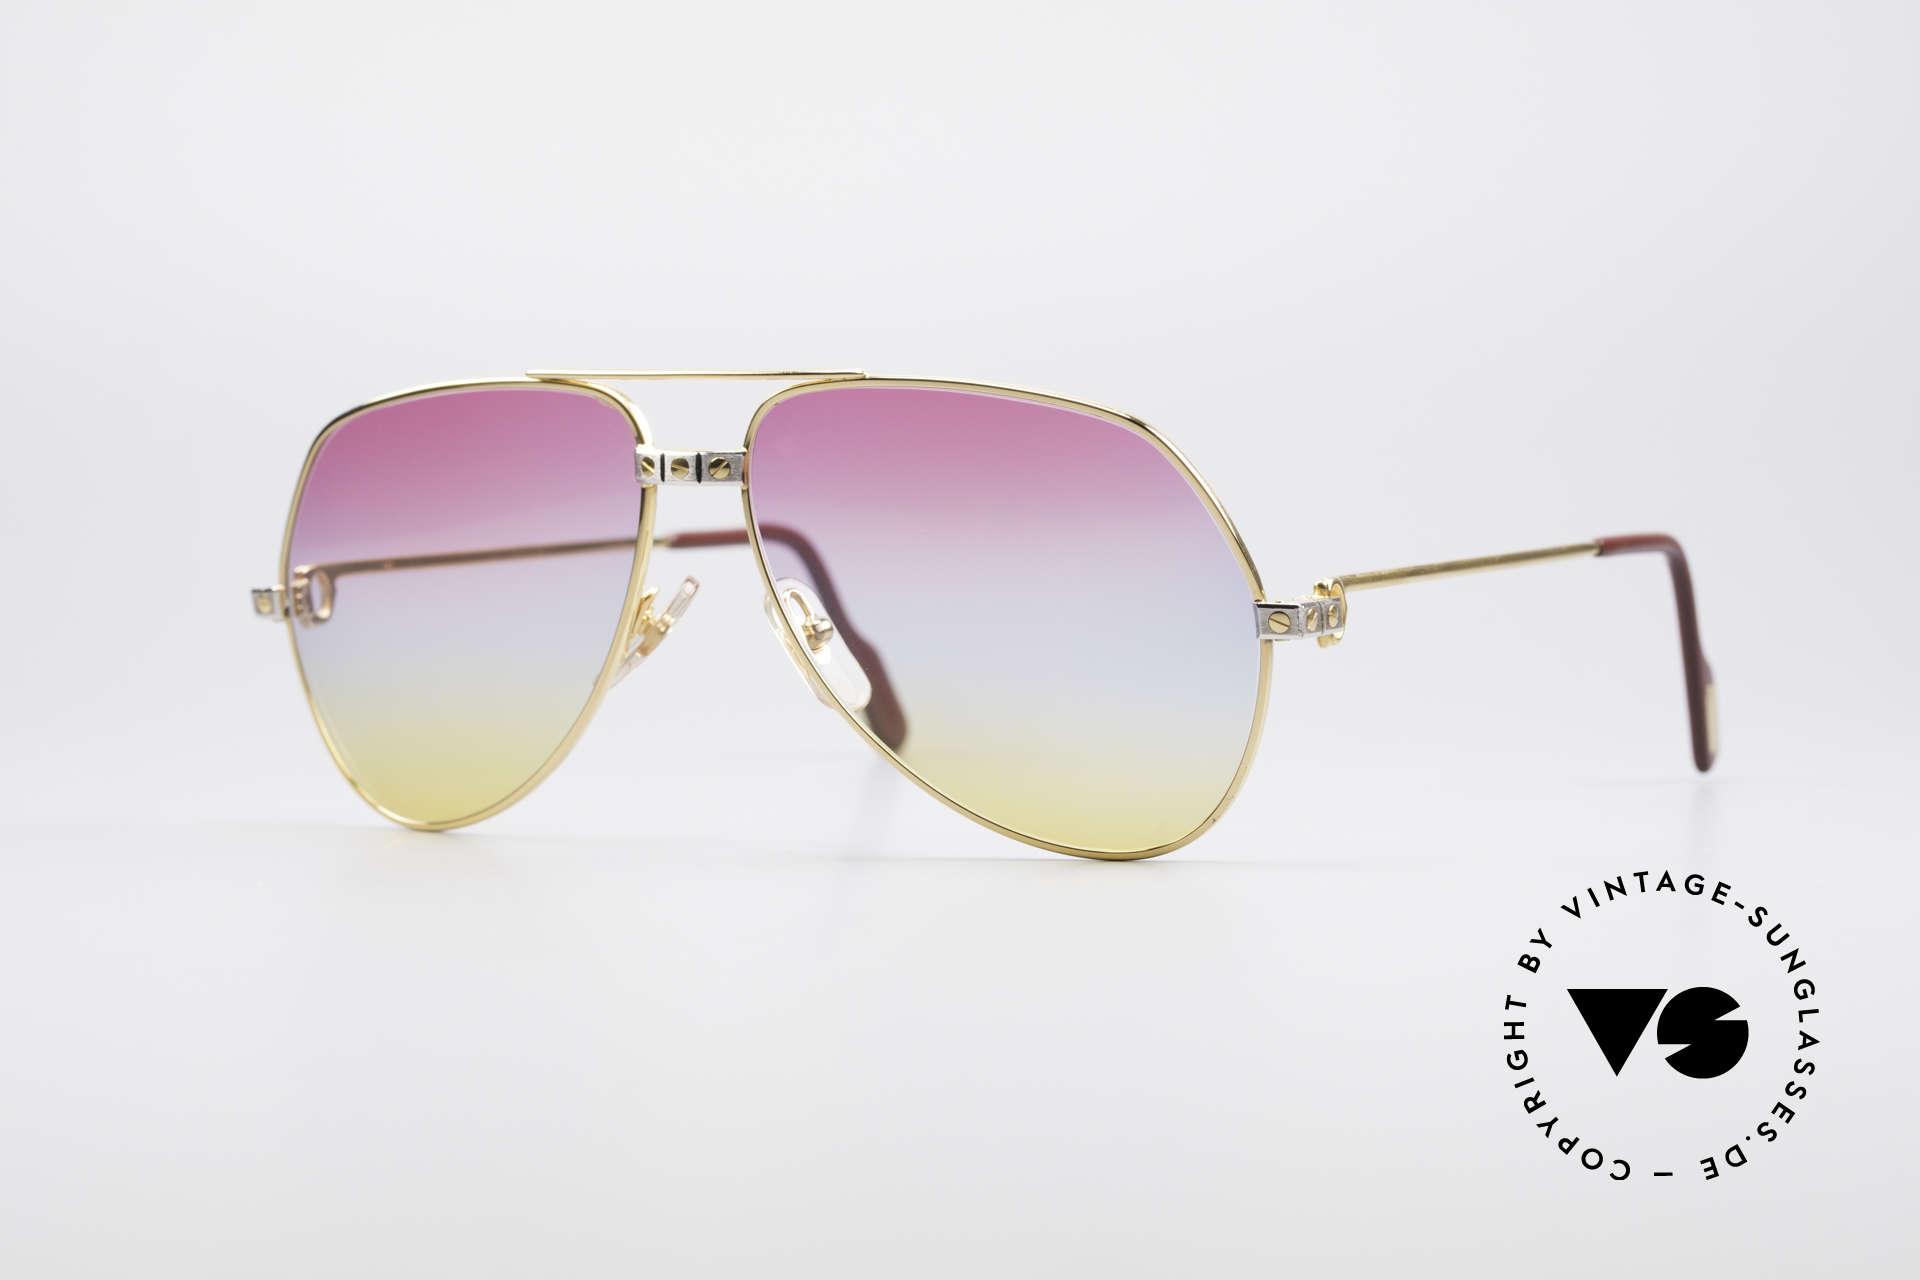 Cartier Vendome Santos - M Rare 80's Aviator Sunglasses, Vendome = the most famous eyewear design by CARTIER, Made for Men and Women